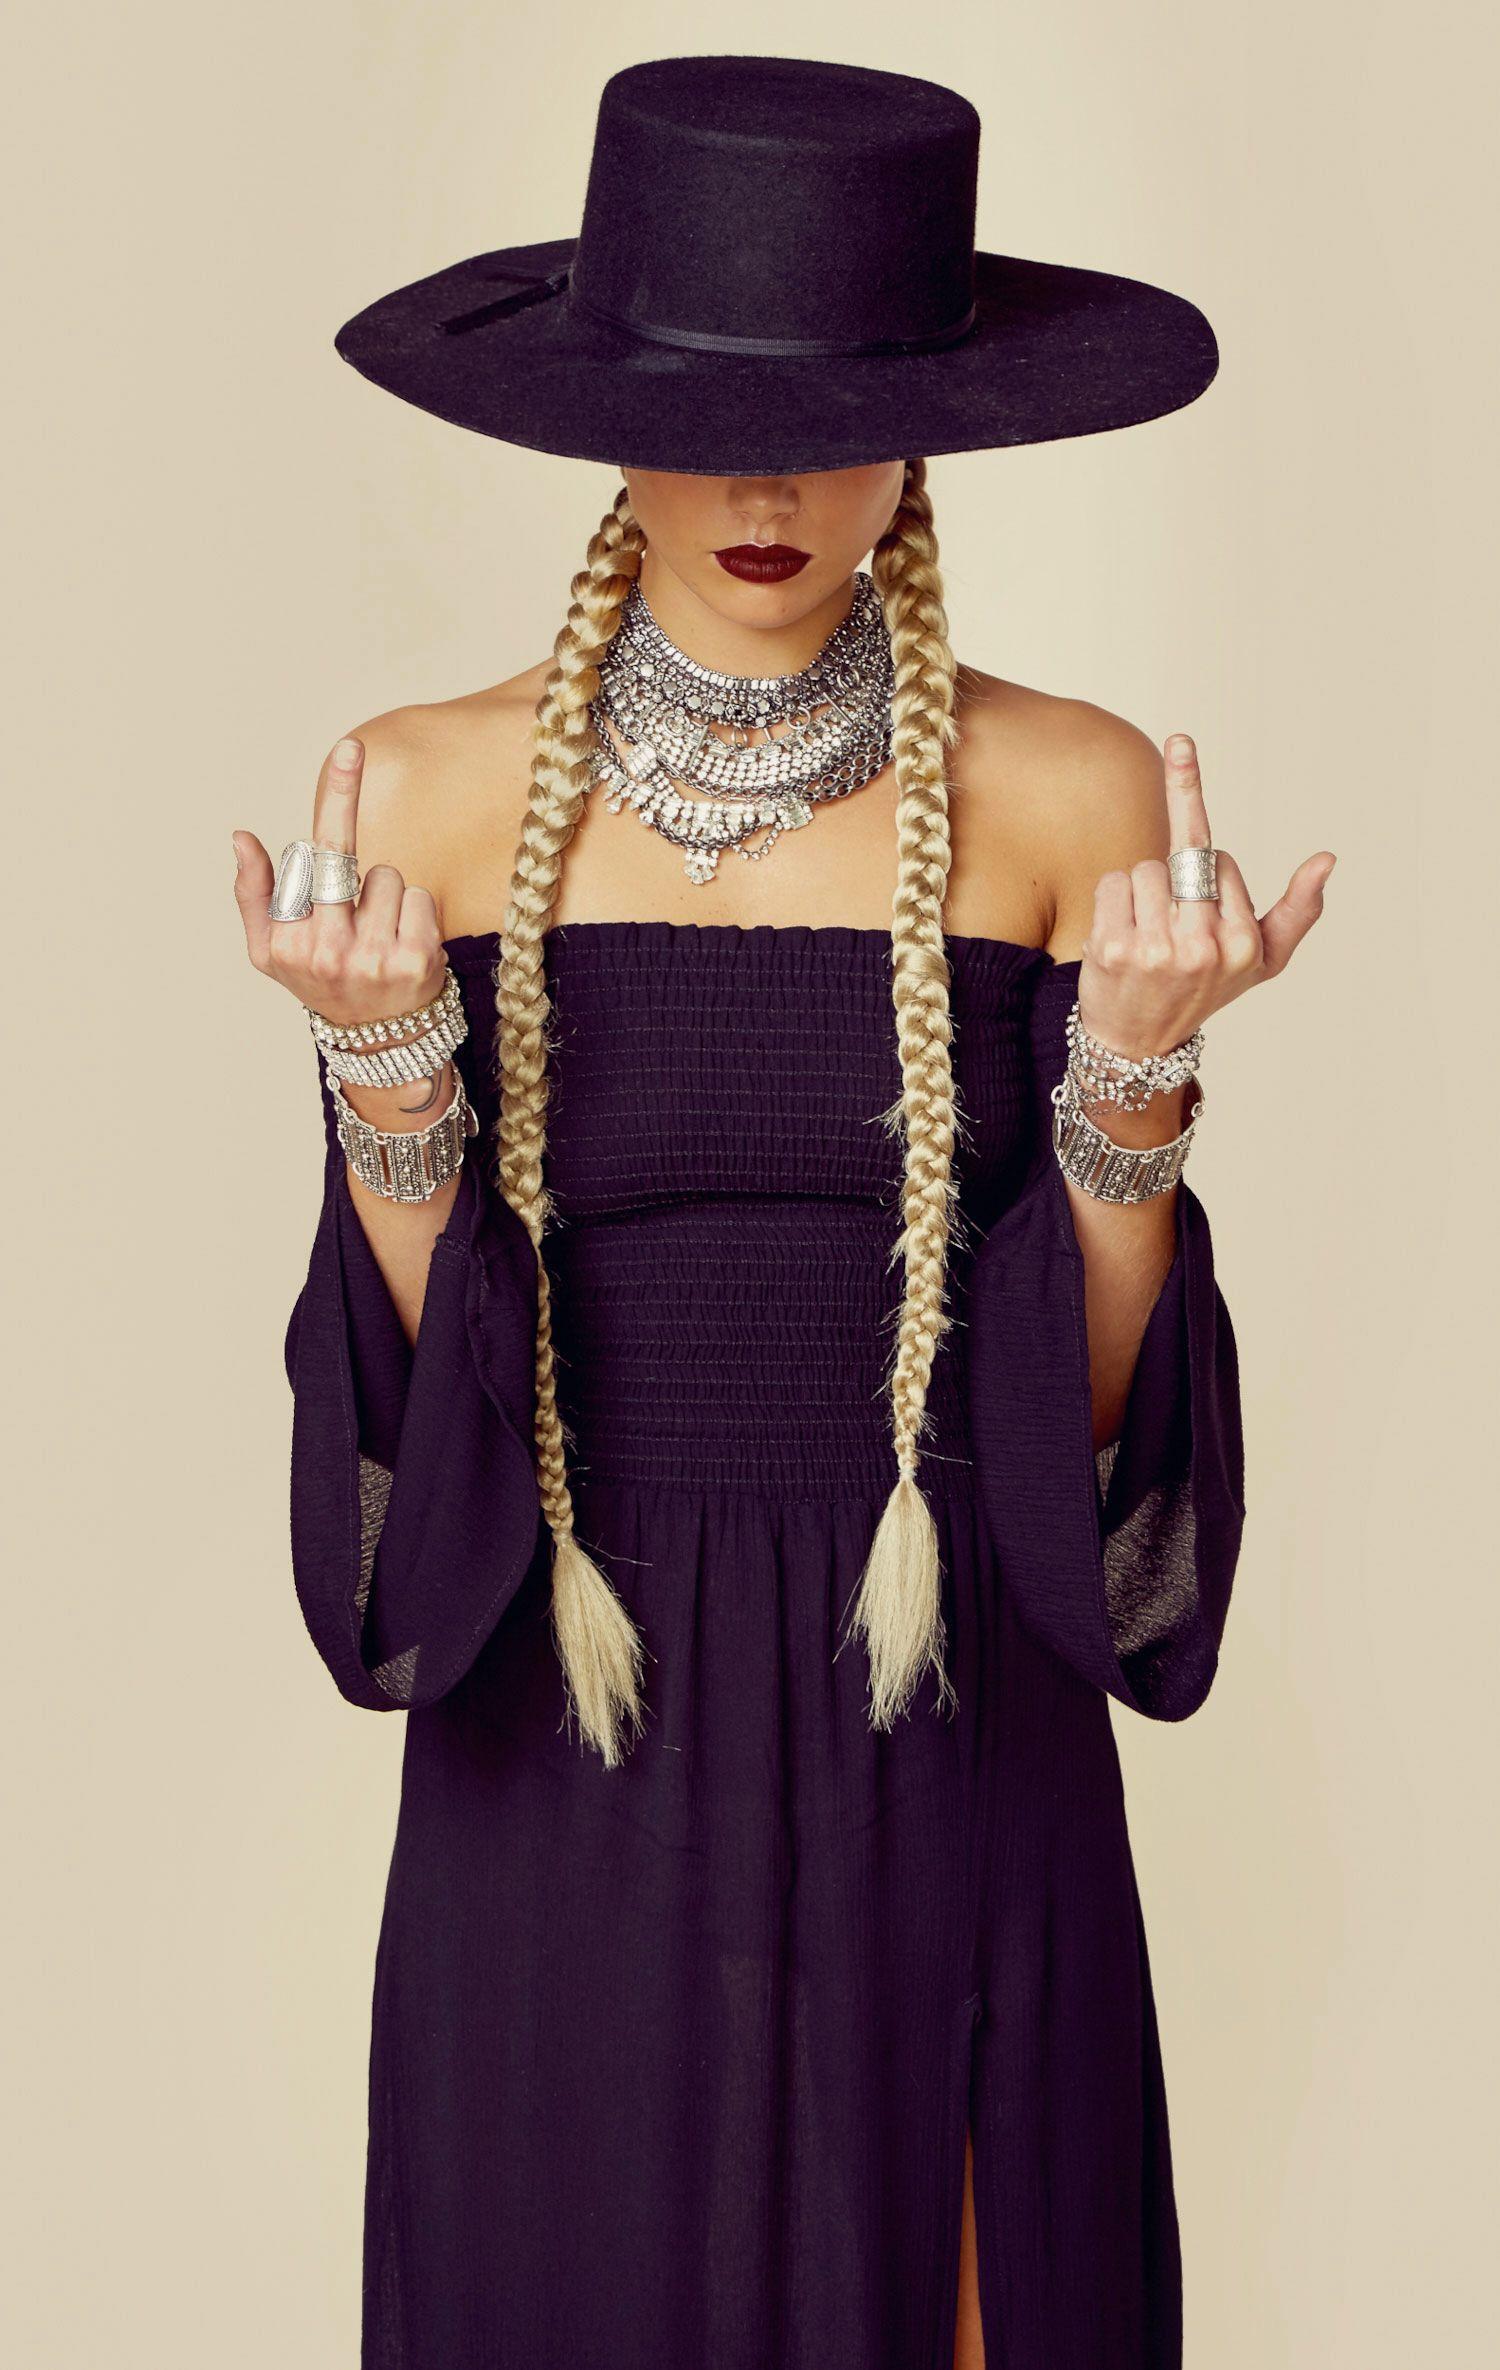 The Halloween Edit - Beyonce #planetblue | HOLIDAY ...